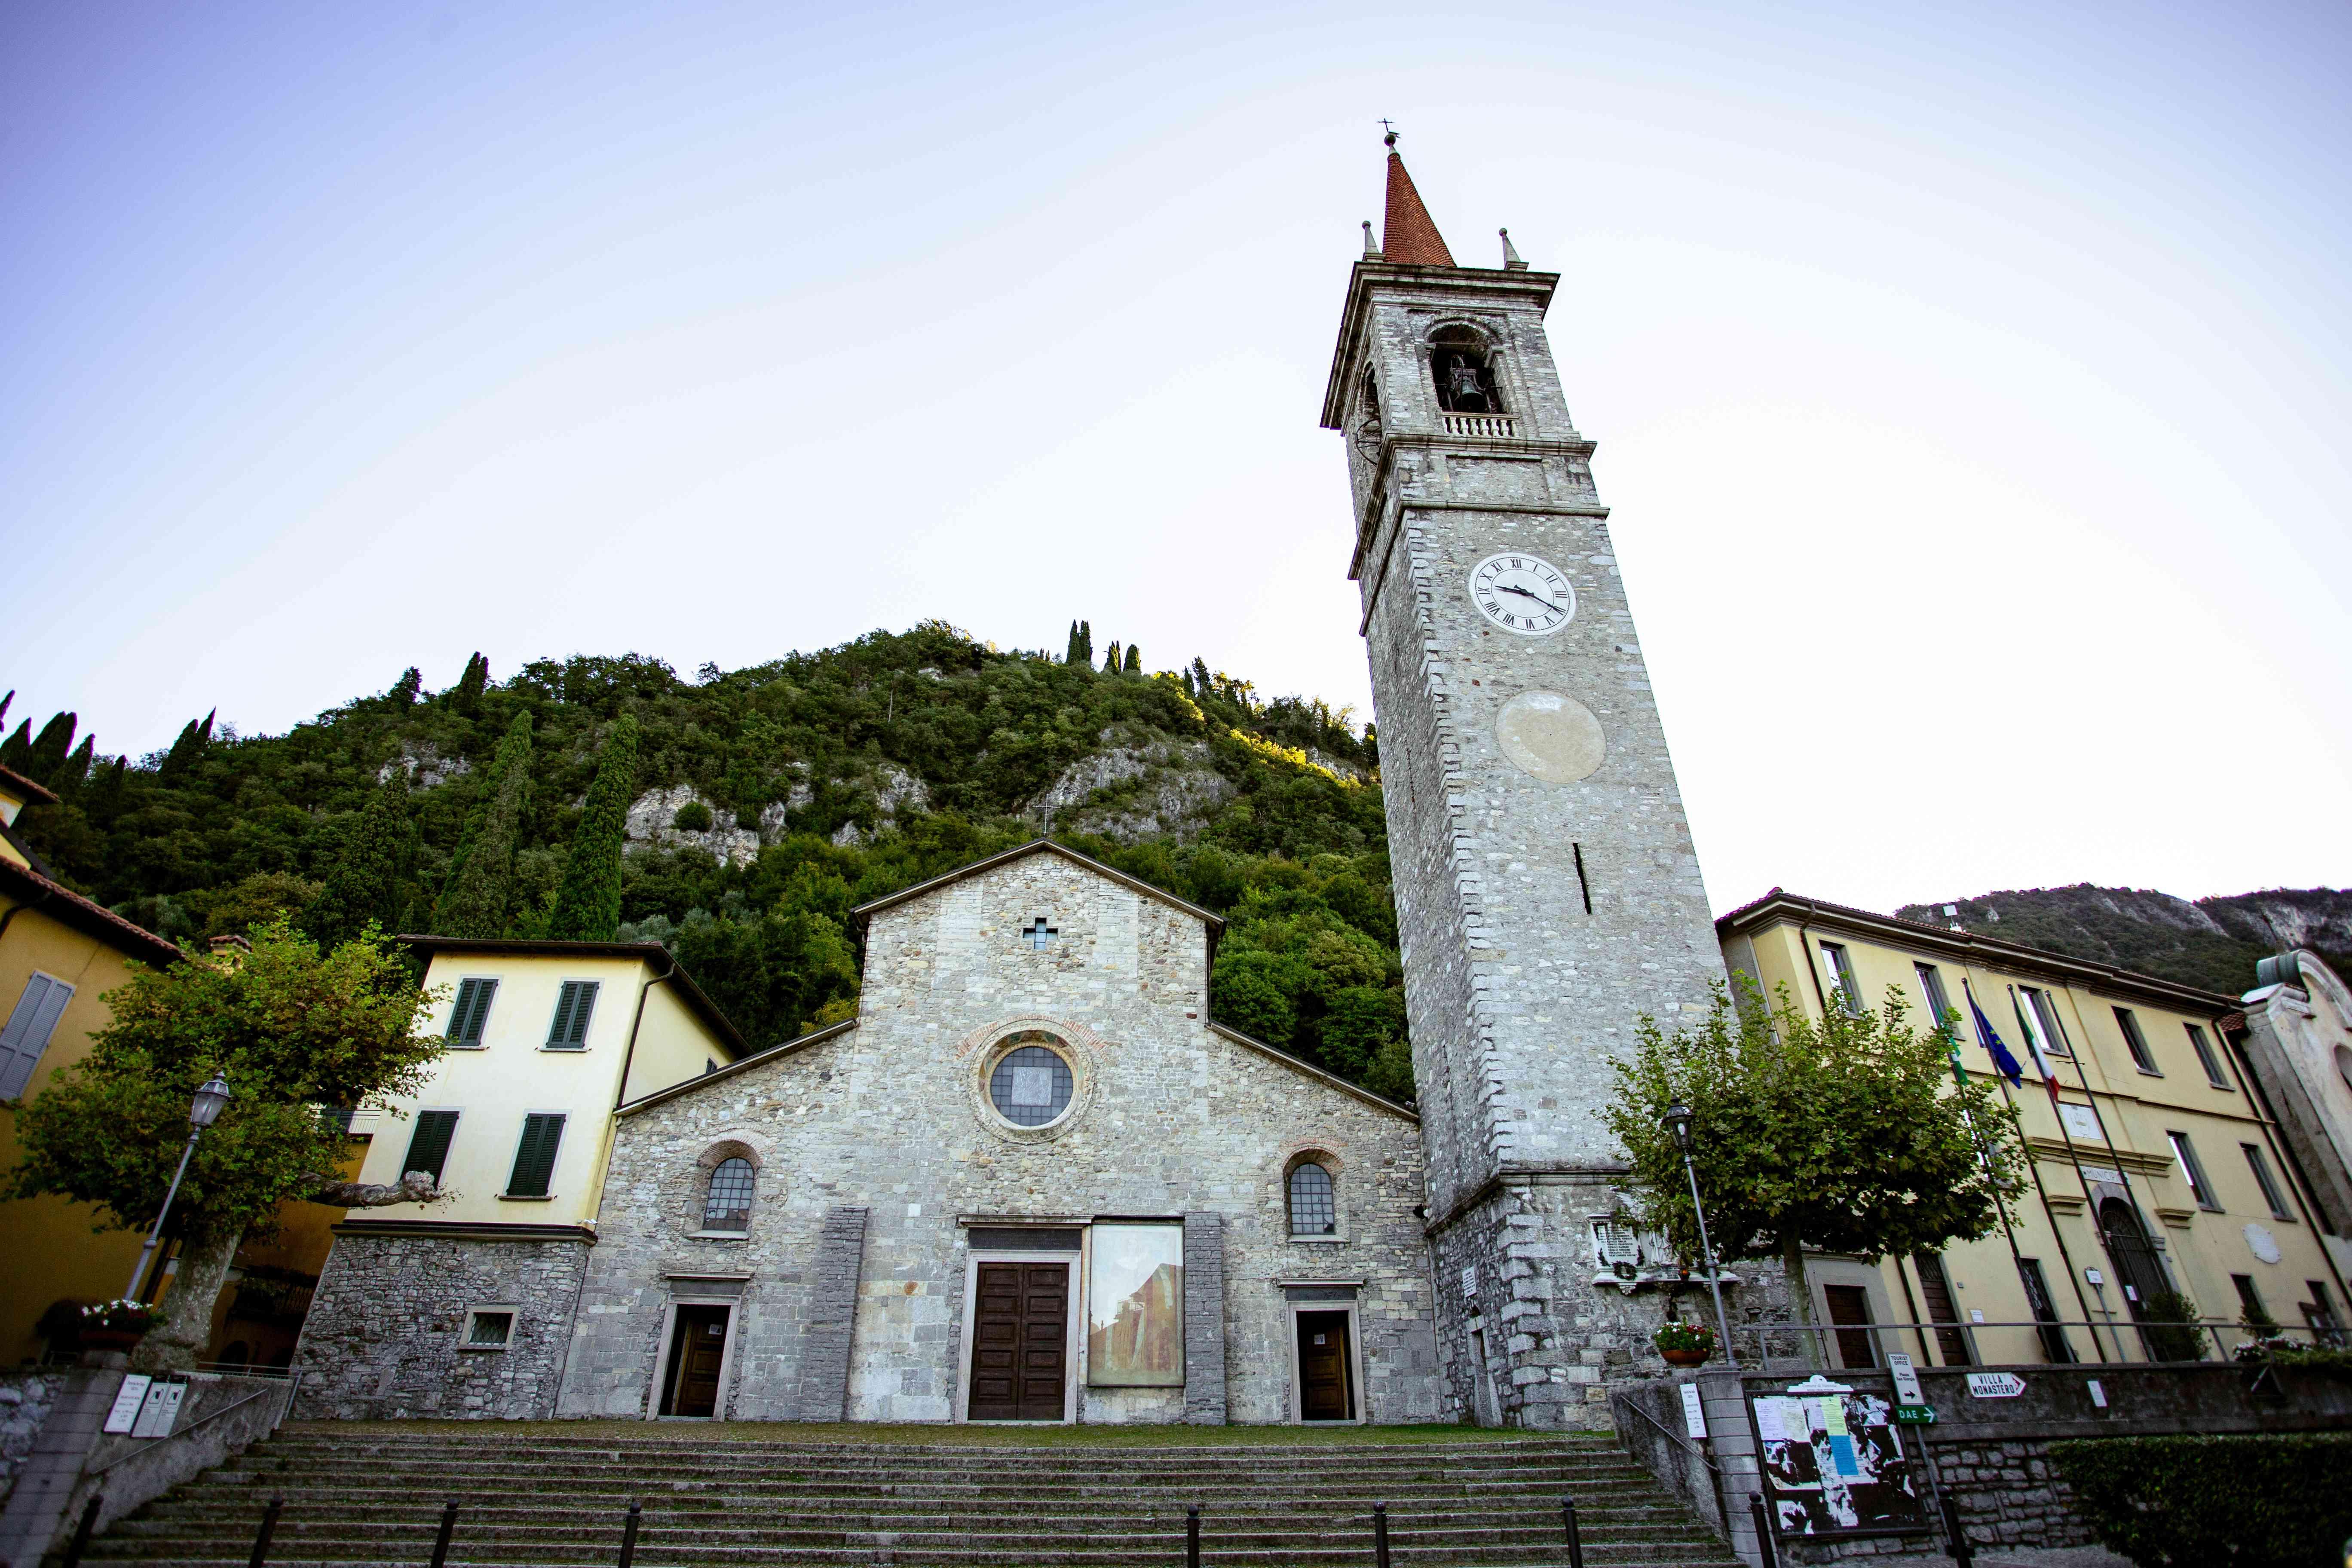 Church of San Giorgio, Varenna, Italy